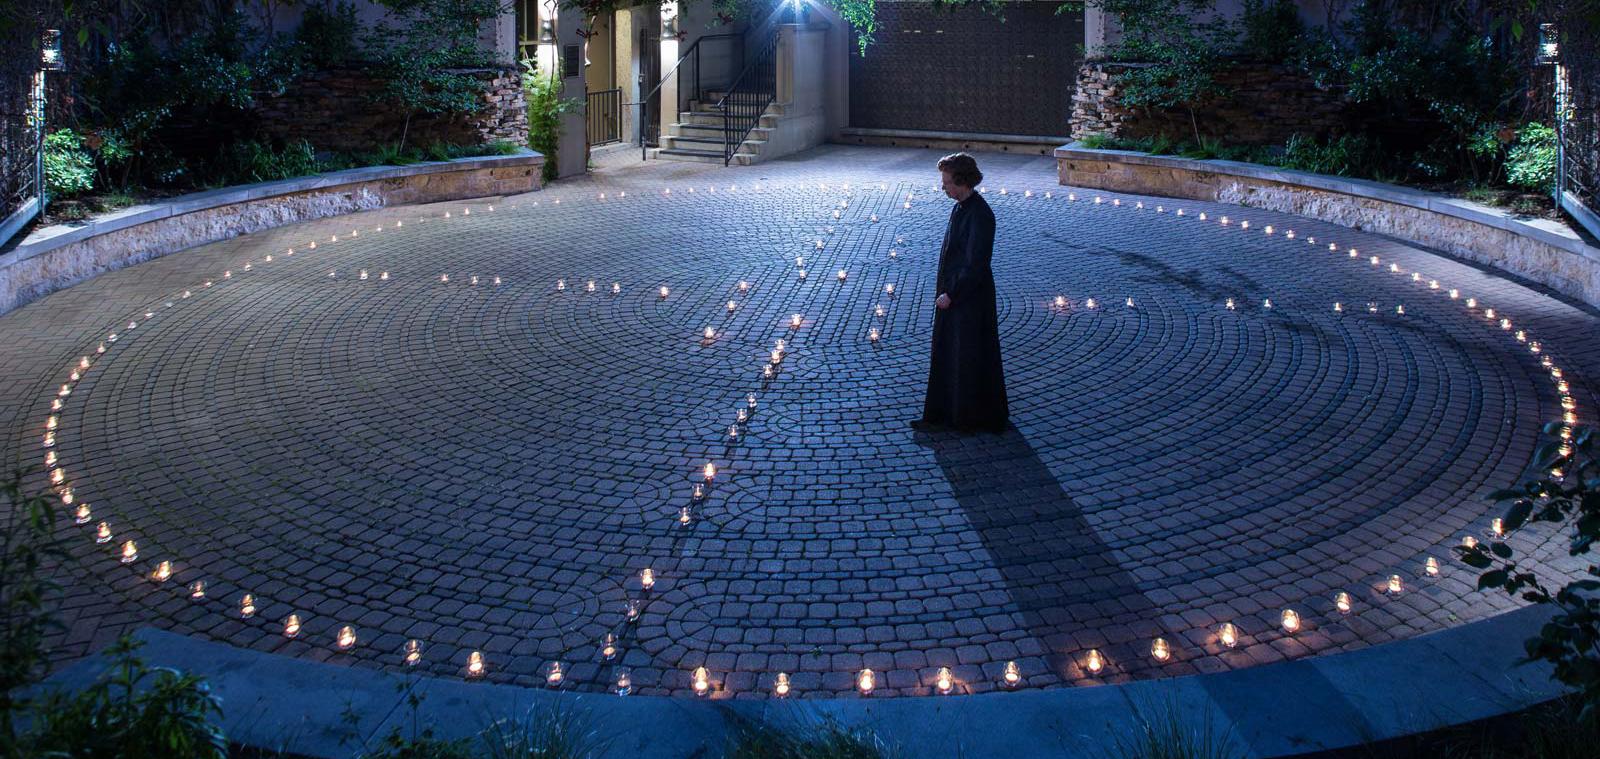 Labyrinth Walking as a Spiritual Practice